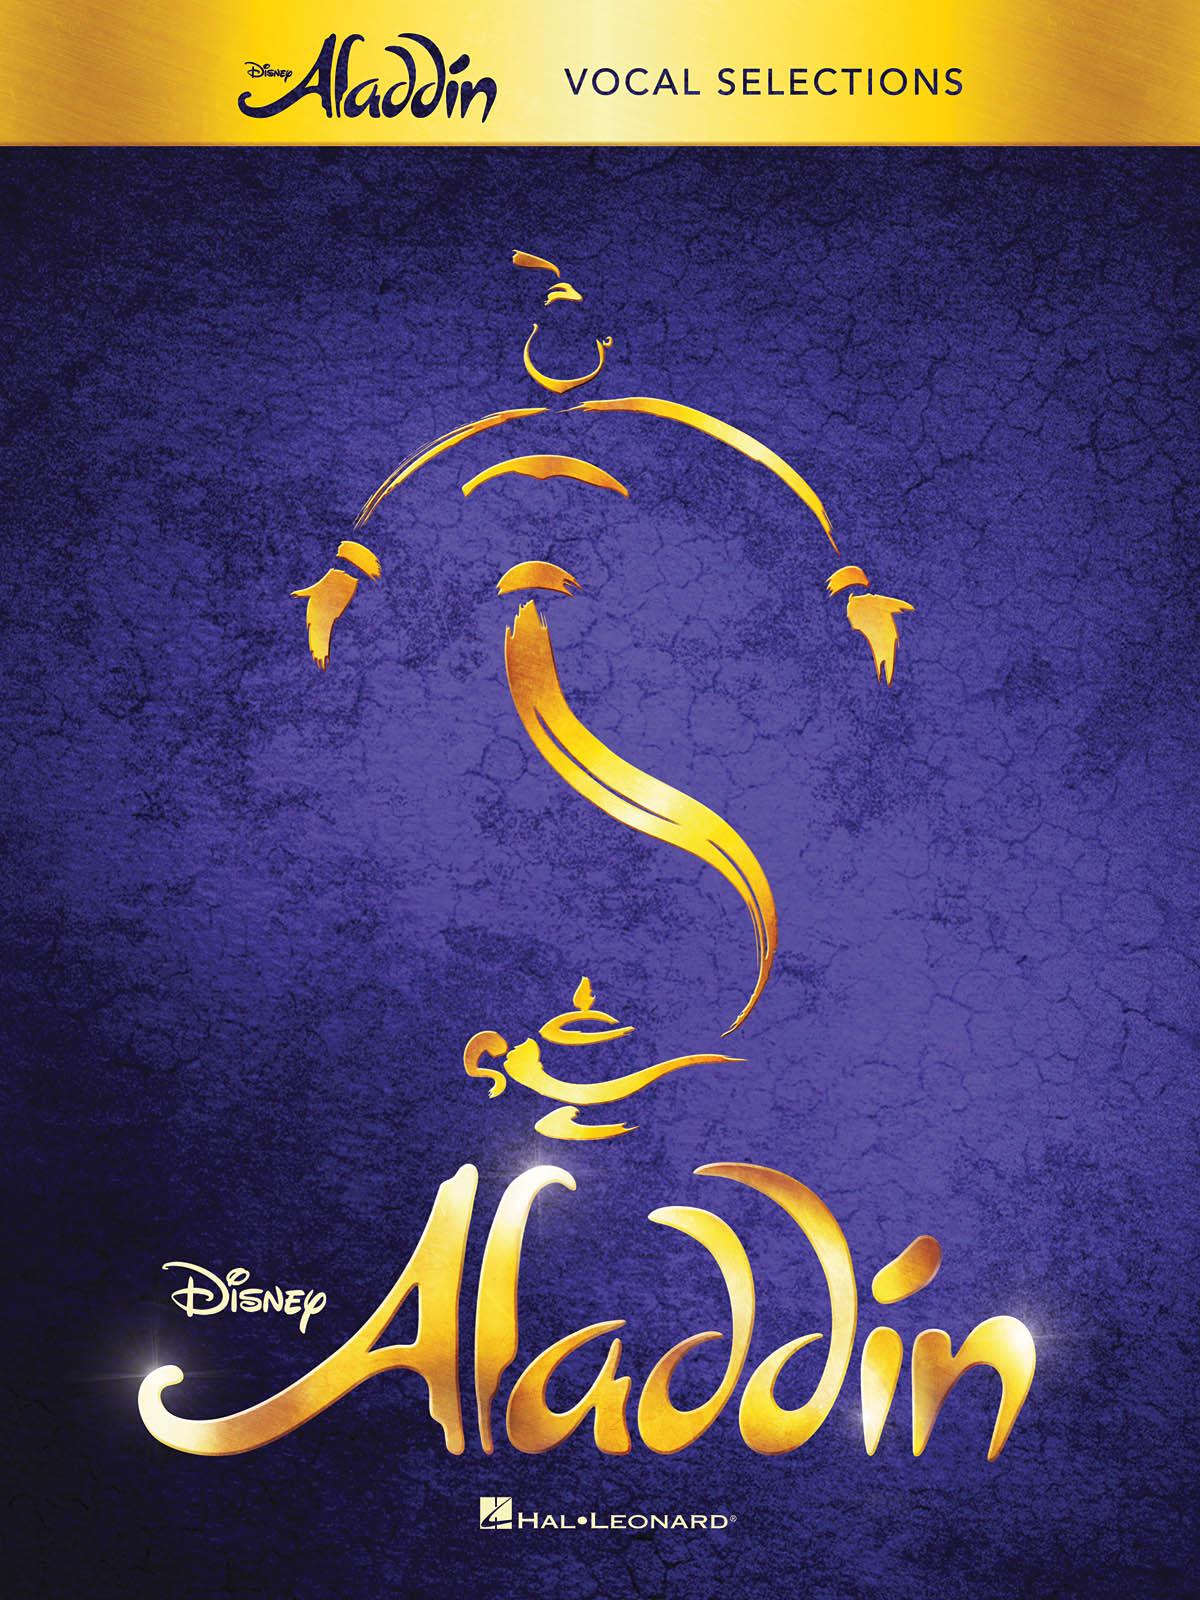 Alan Menken: Aladdin - Broadway Musical Vocal Selections: Vocal Solo: Album